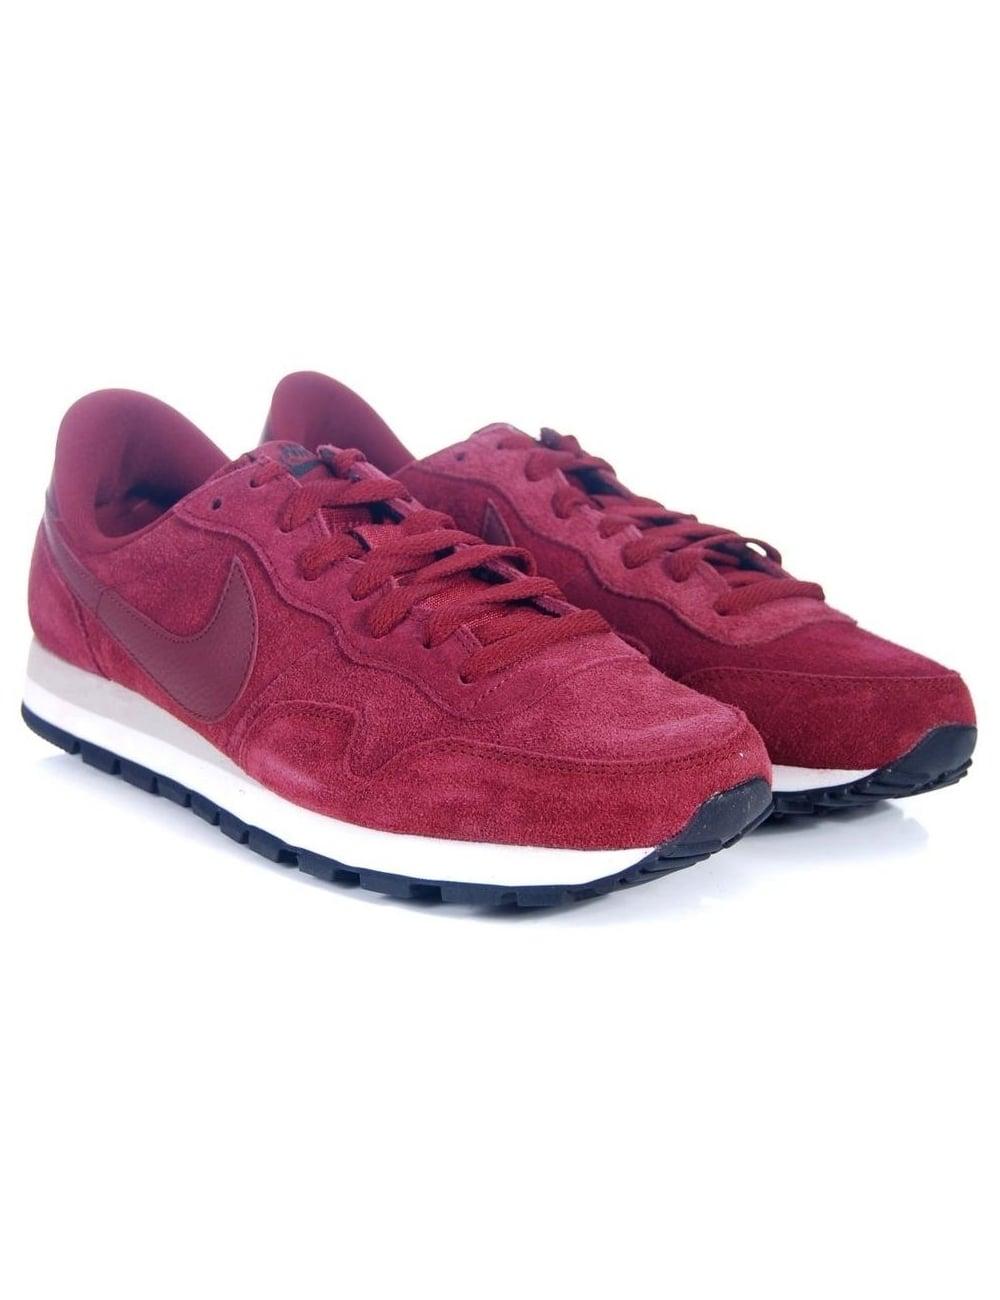 b8cc44d5075c Nike Air Pegasus 83 Suede - Team Red - Footwear from Fat Buddha Store UK